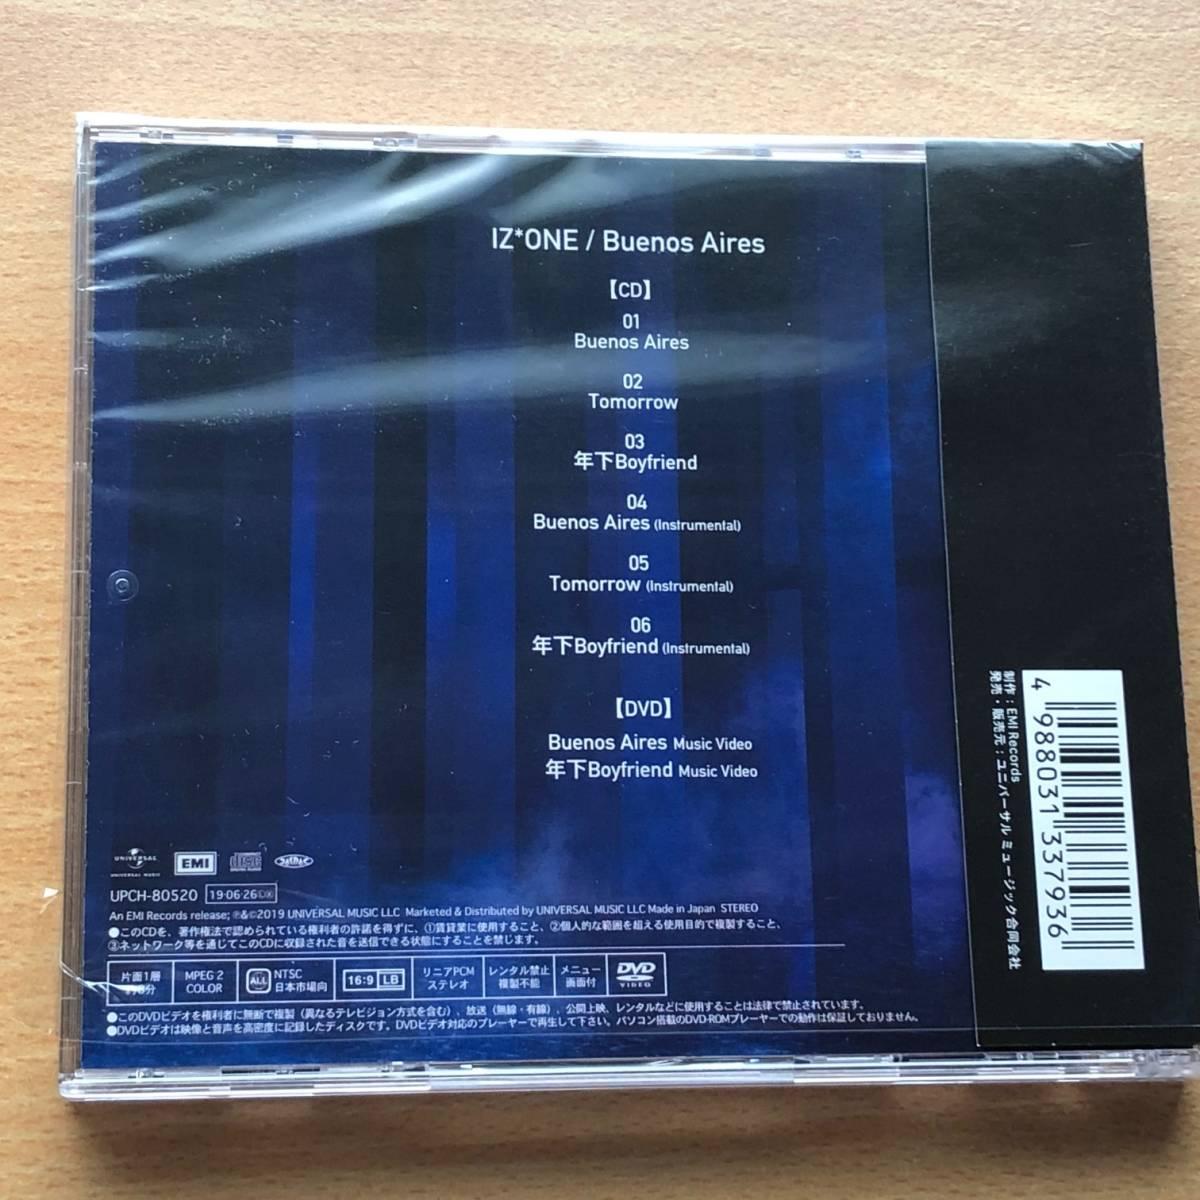 IZ*ONE(アイズワン)JAPAN 2nd Single『 Buenos Aires 』限定特典生写真 矢吹奈子 & CD(DVD)TYPE-B盤 セット 新品 未試聴_画像3